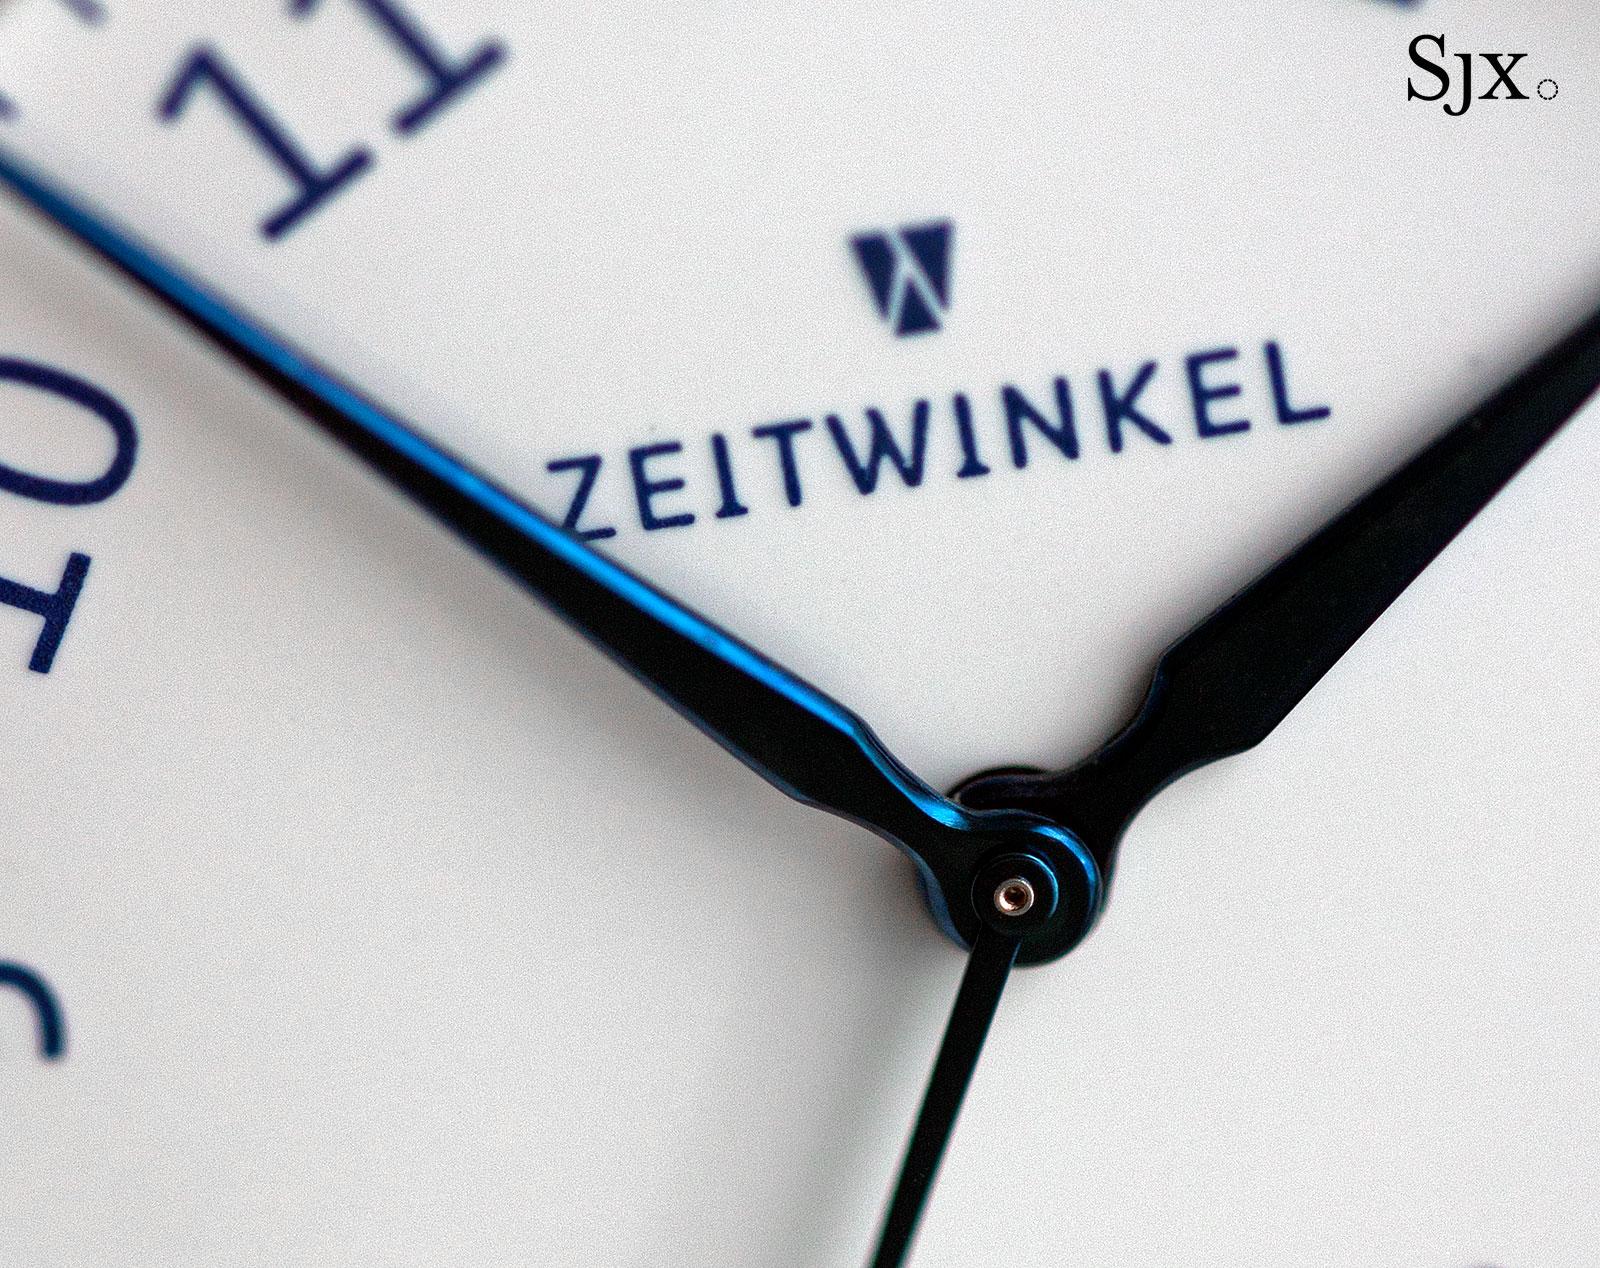 Zeitwinkel 082° émail grand feu enamel dial 2